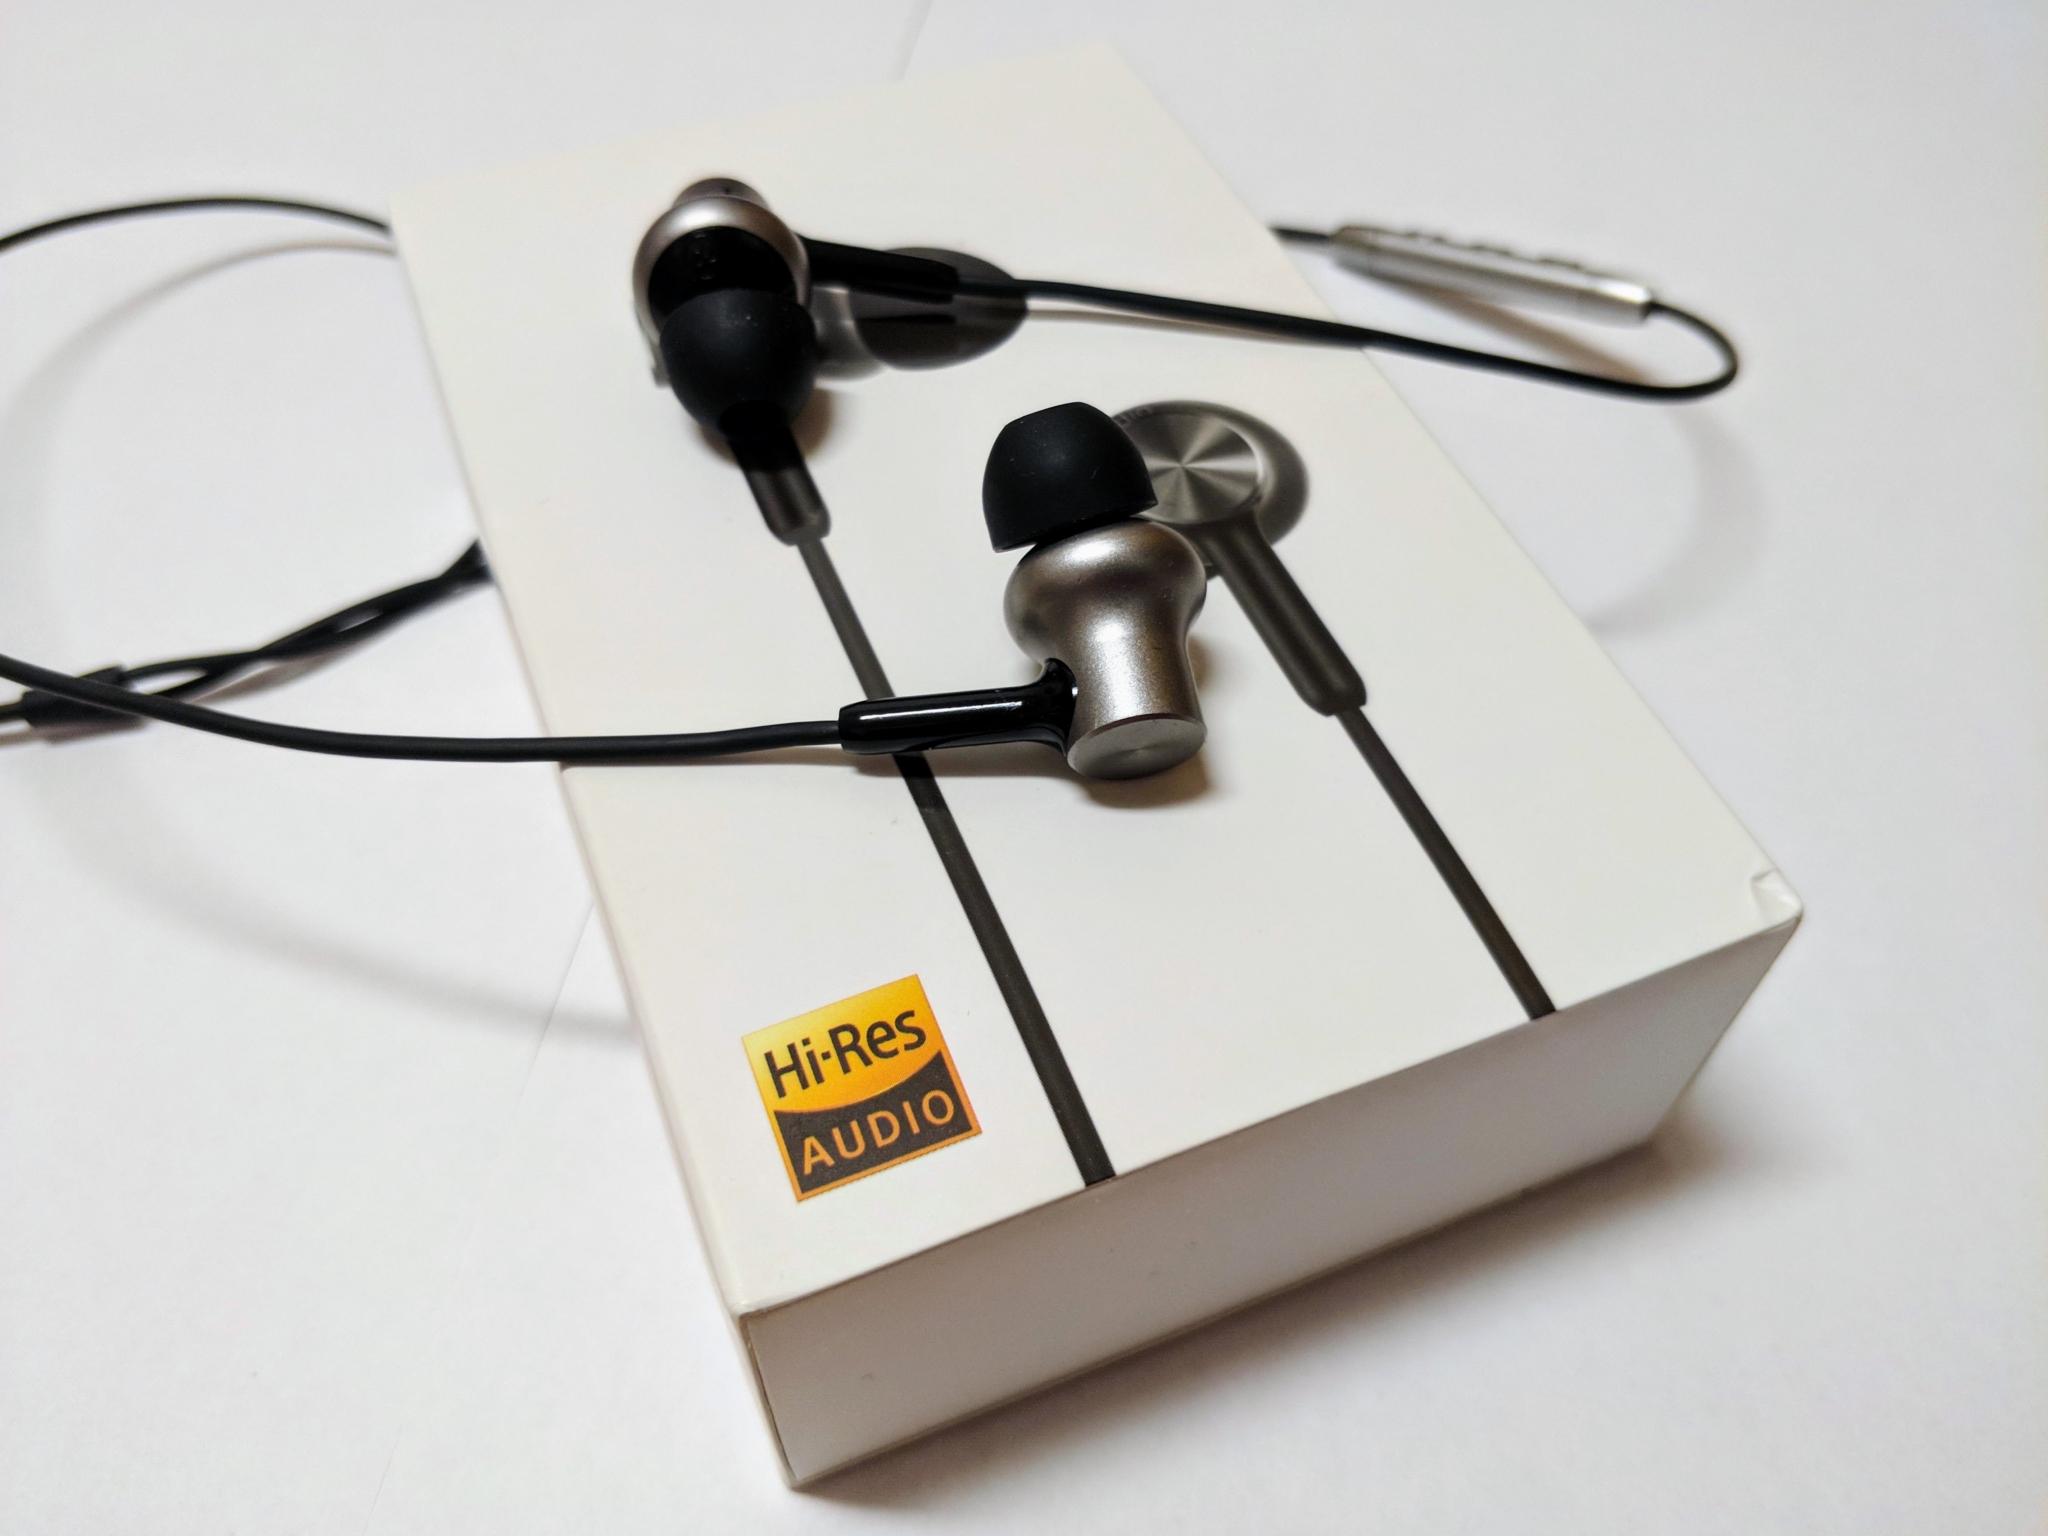 Mi In-Ear sluchátka Pro HD – špunty s dobrým zvukem [recenze]